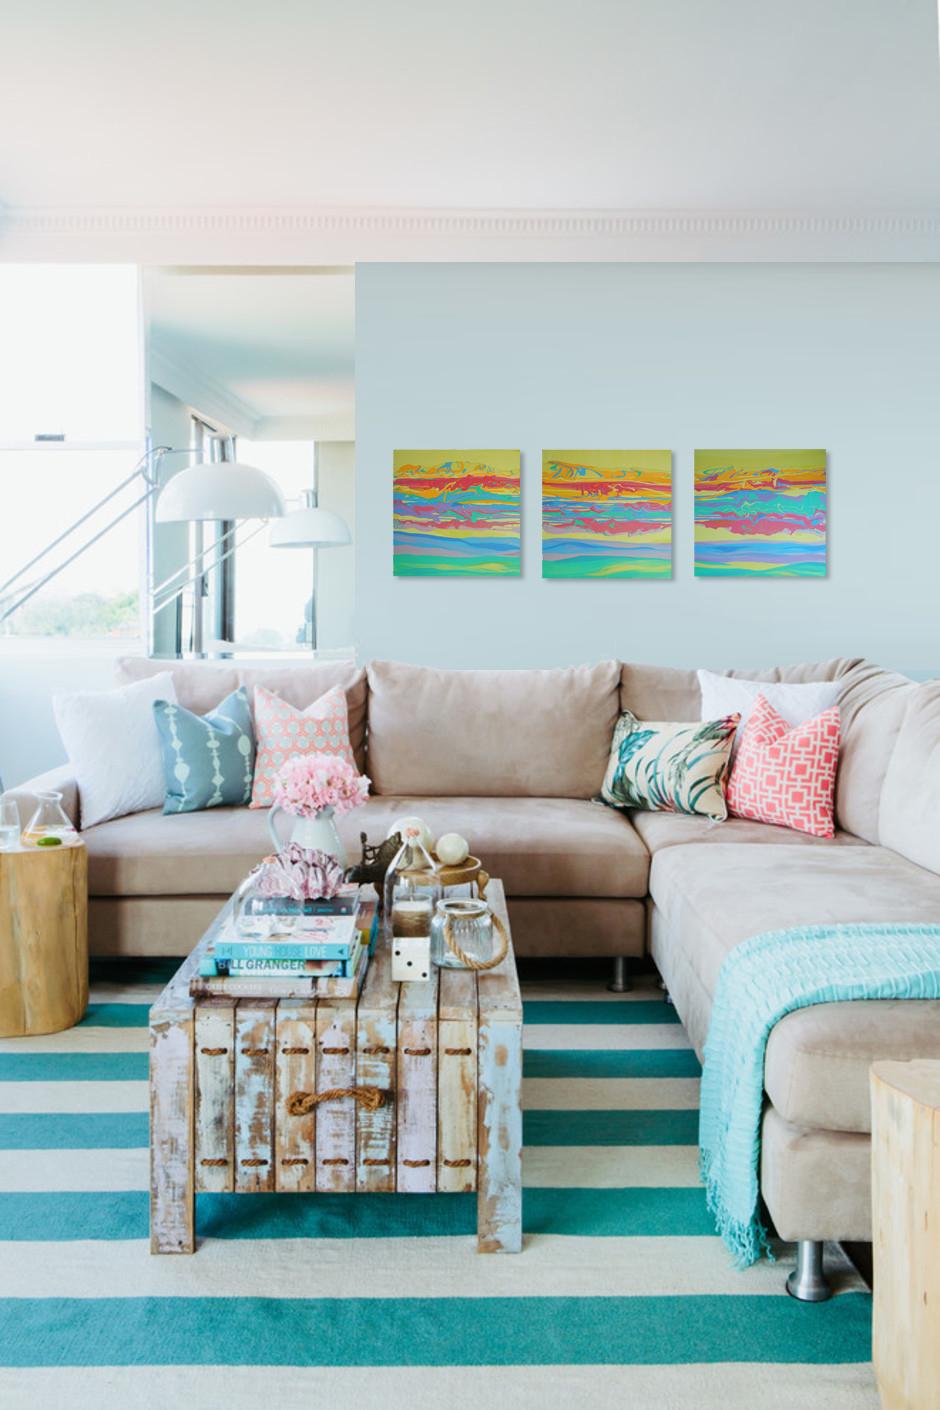 Декор для дома в стиле минимализм.